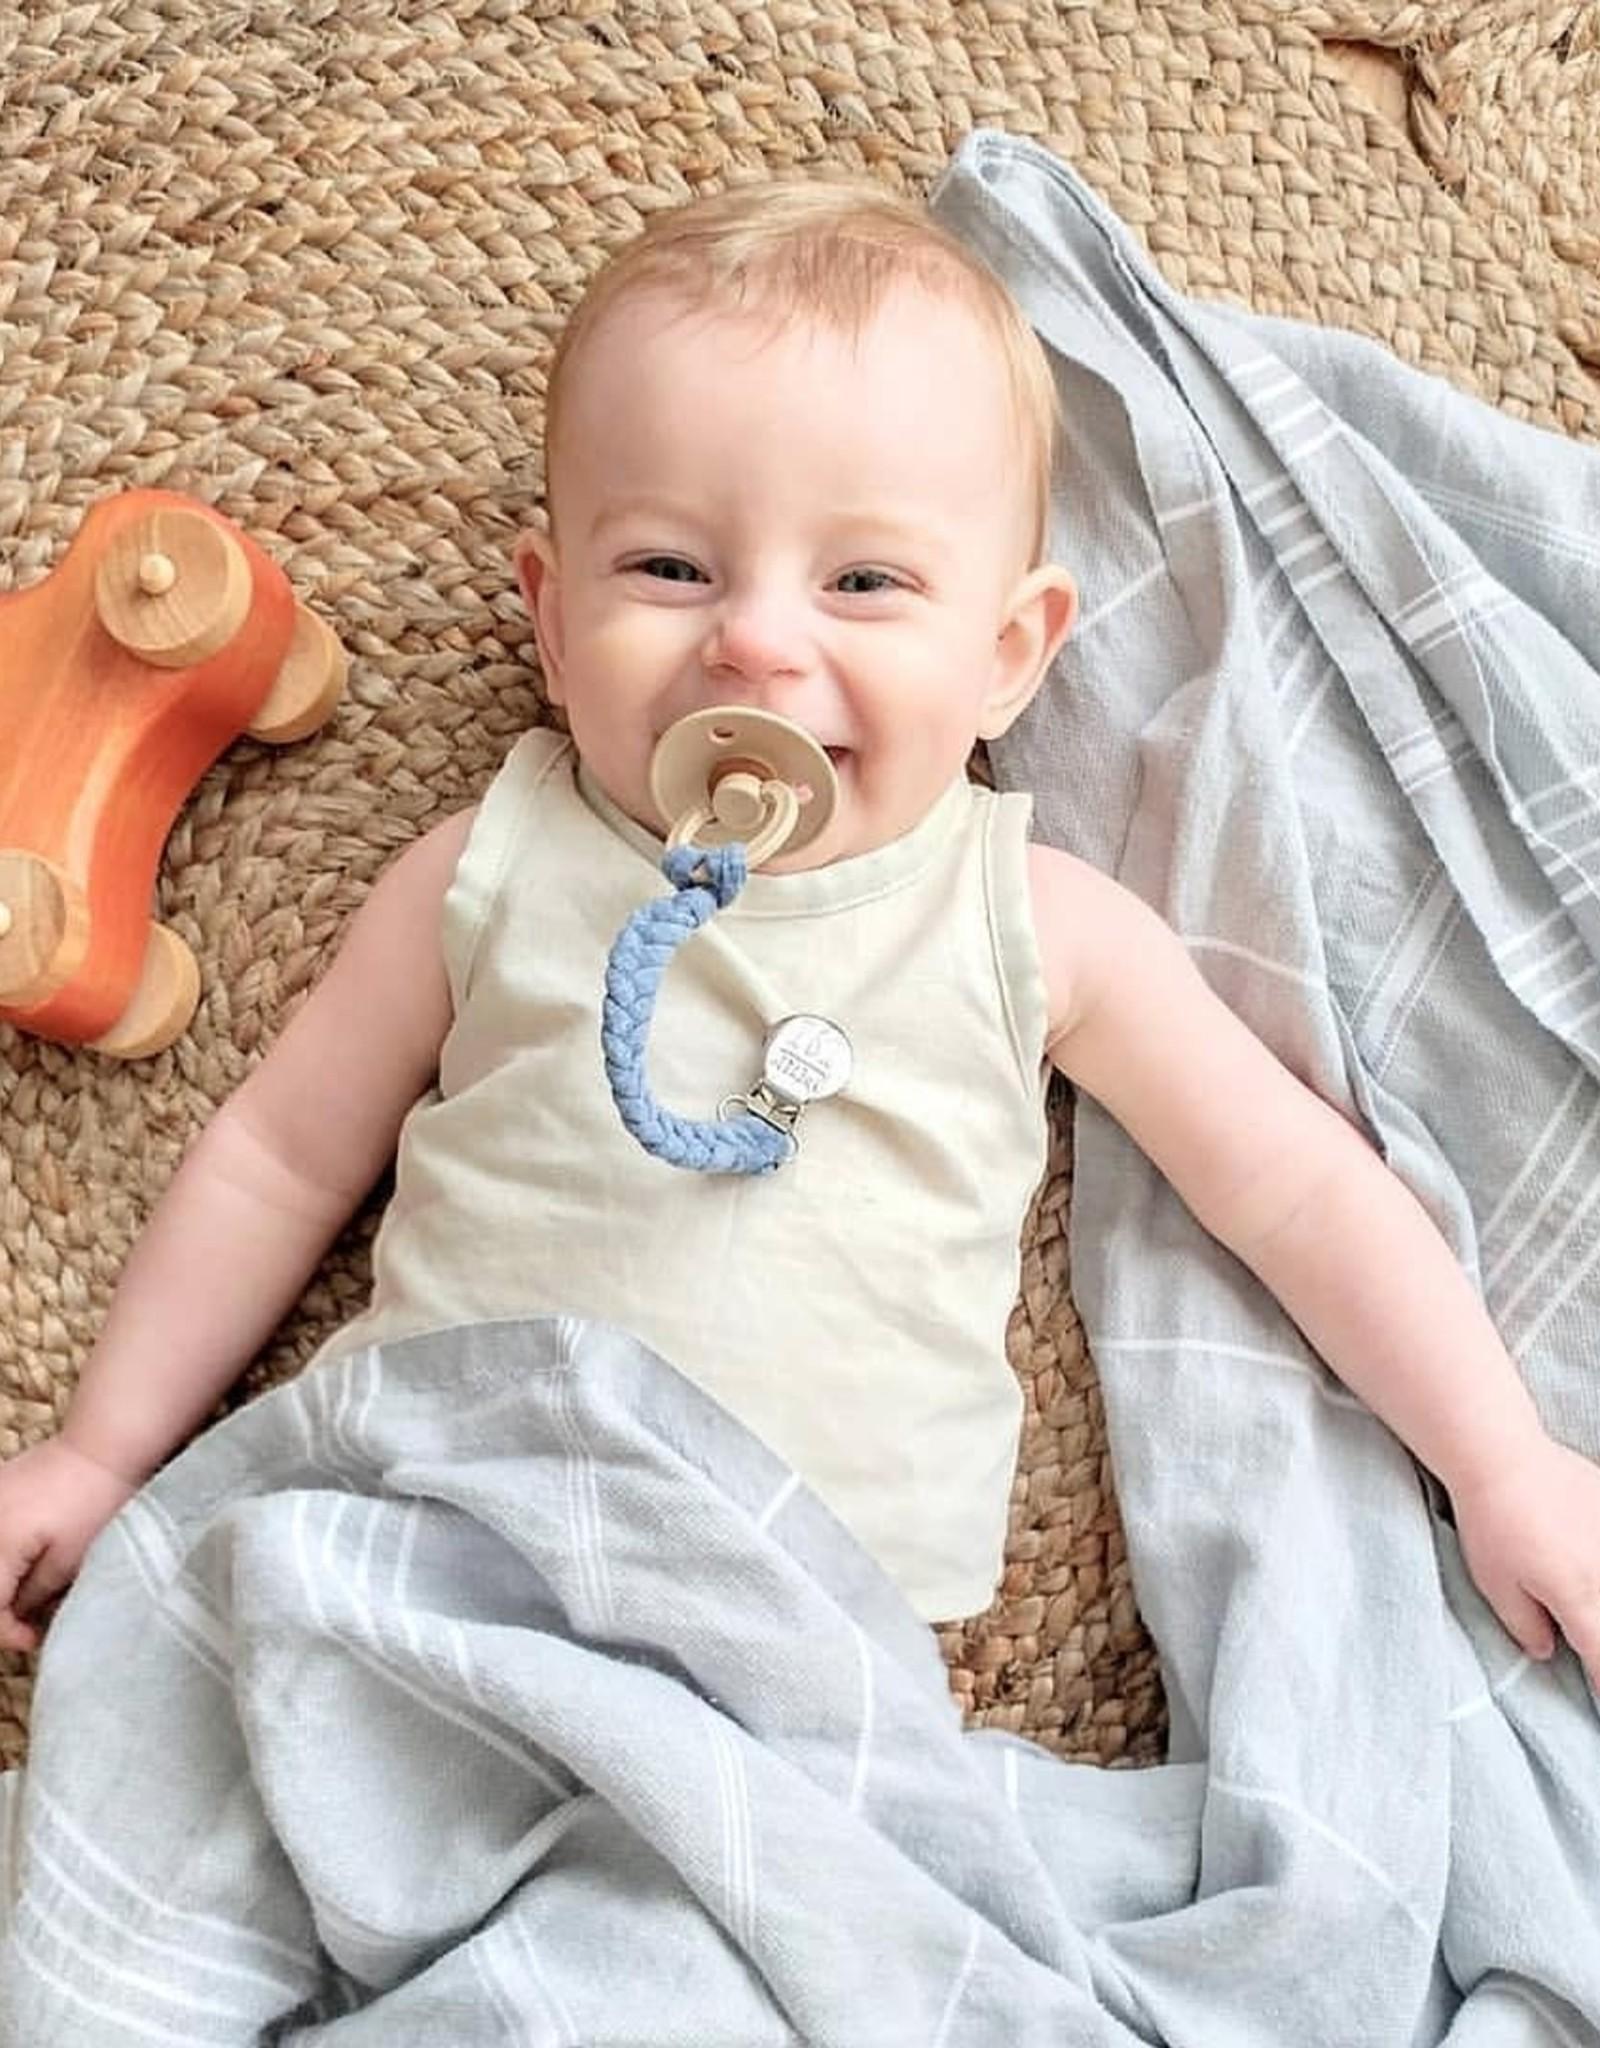 Petit Tot Attache-suce tressée - Bleu bébé